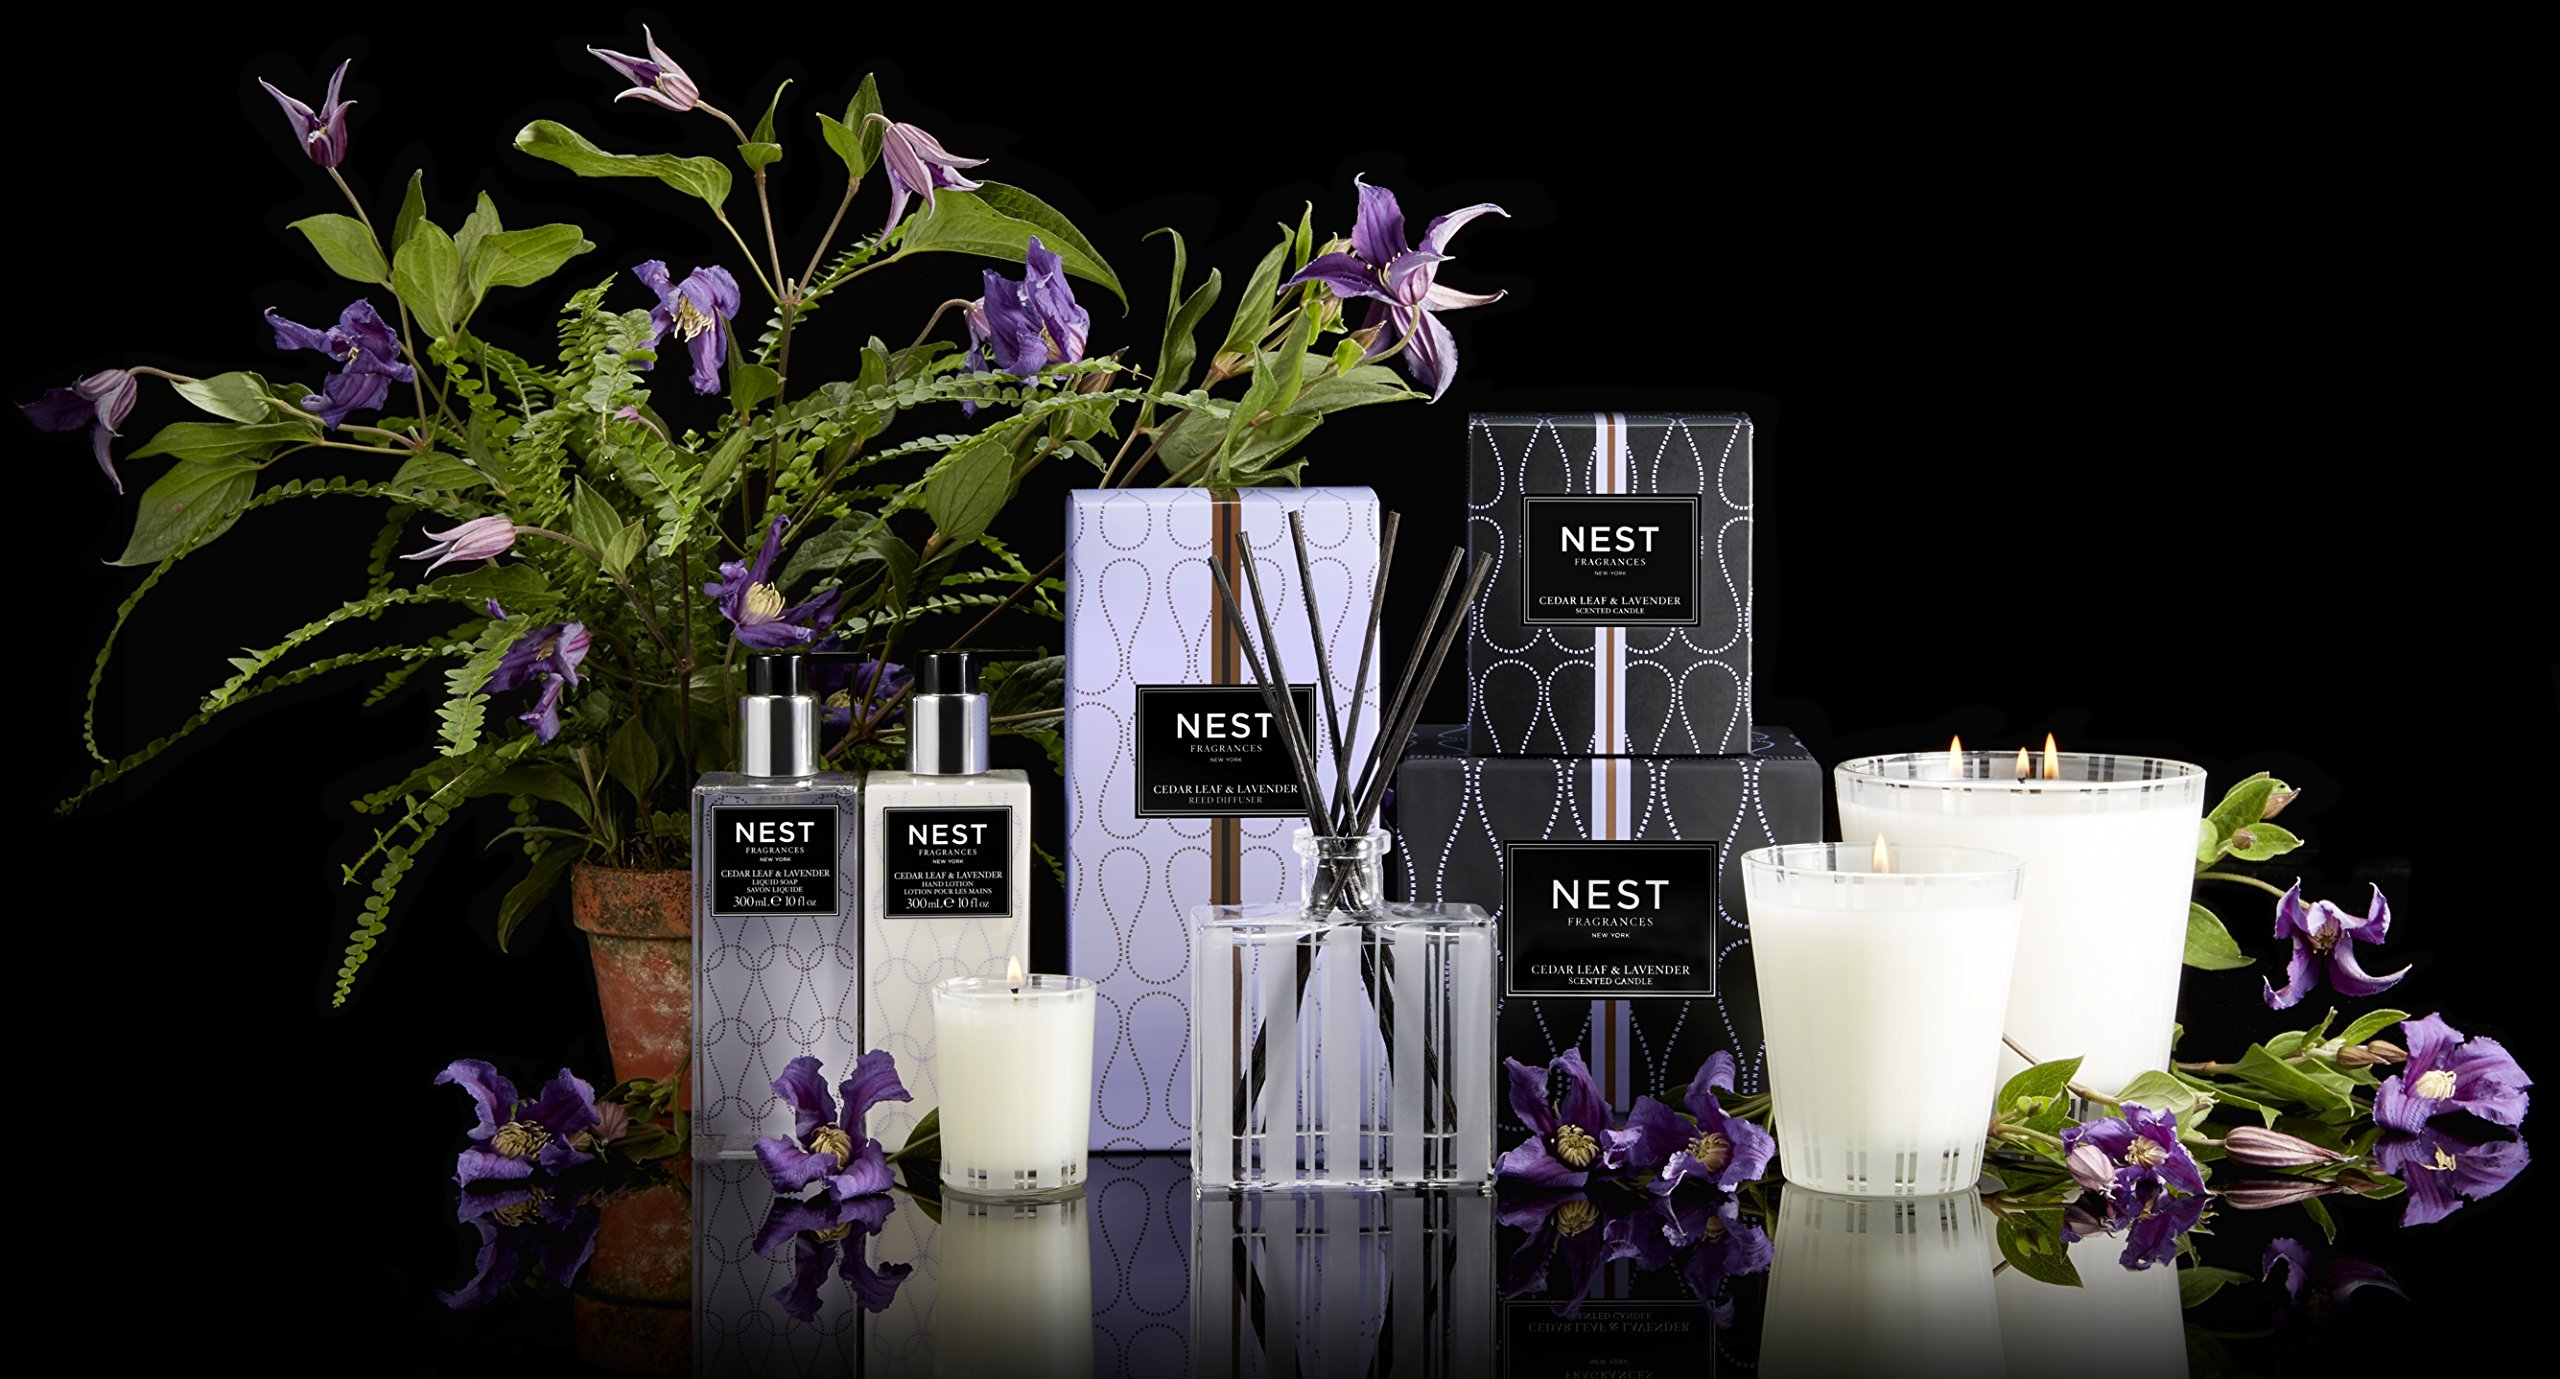 NEST Fragrances Classic Candle- Cedar Leaf & Lavendar, 8.1 oz by NEST Fragrances (Image #3)